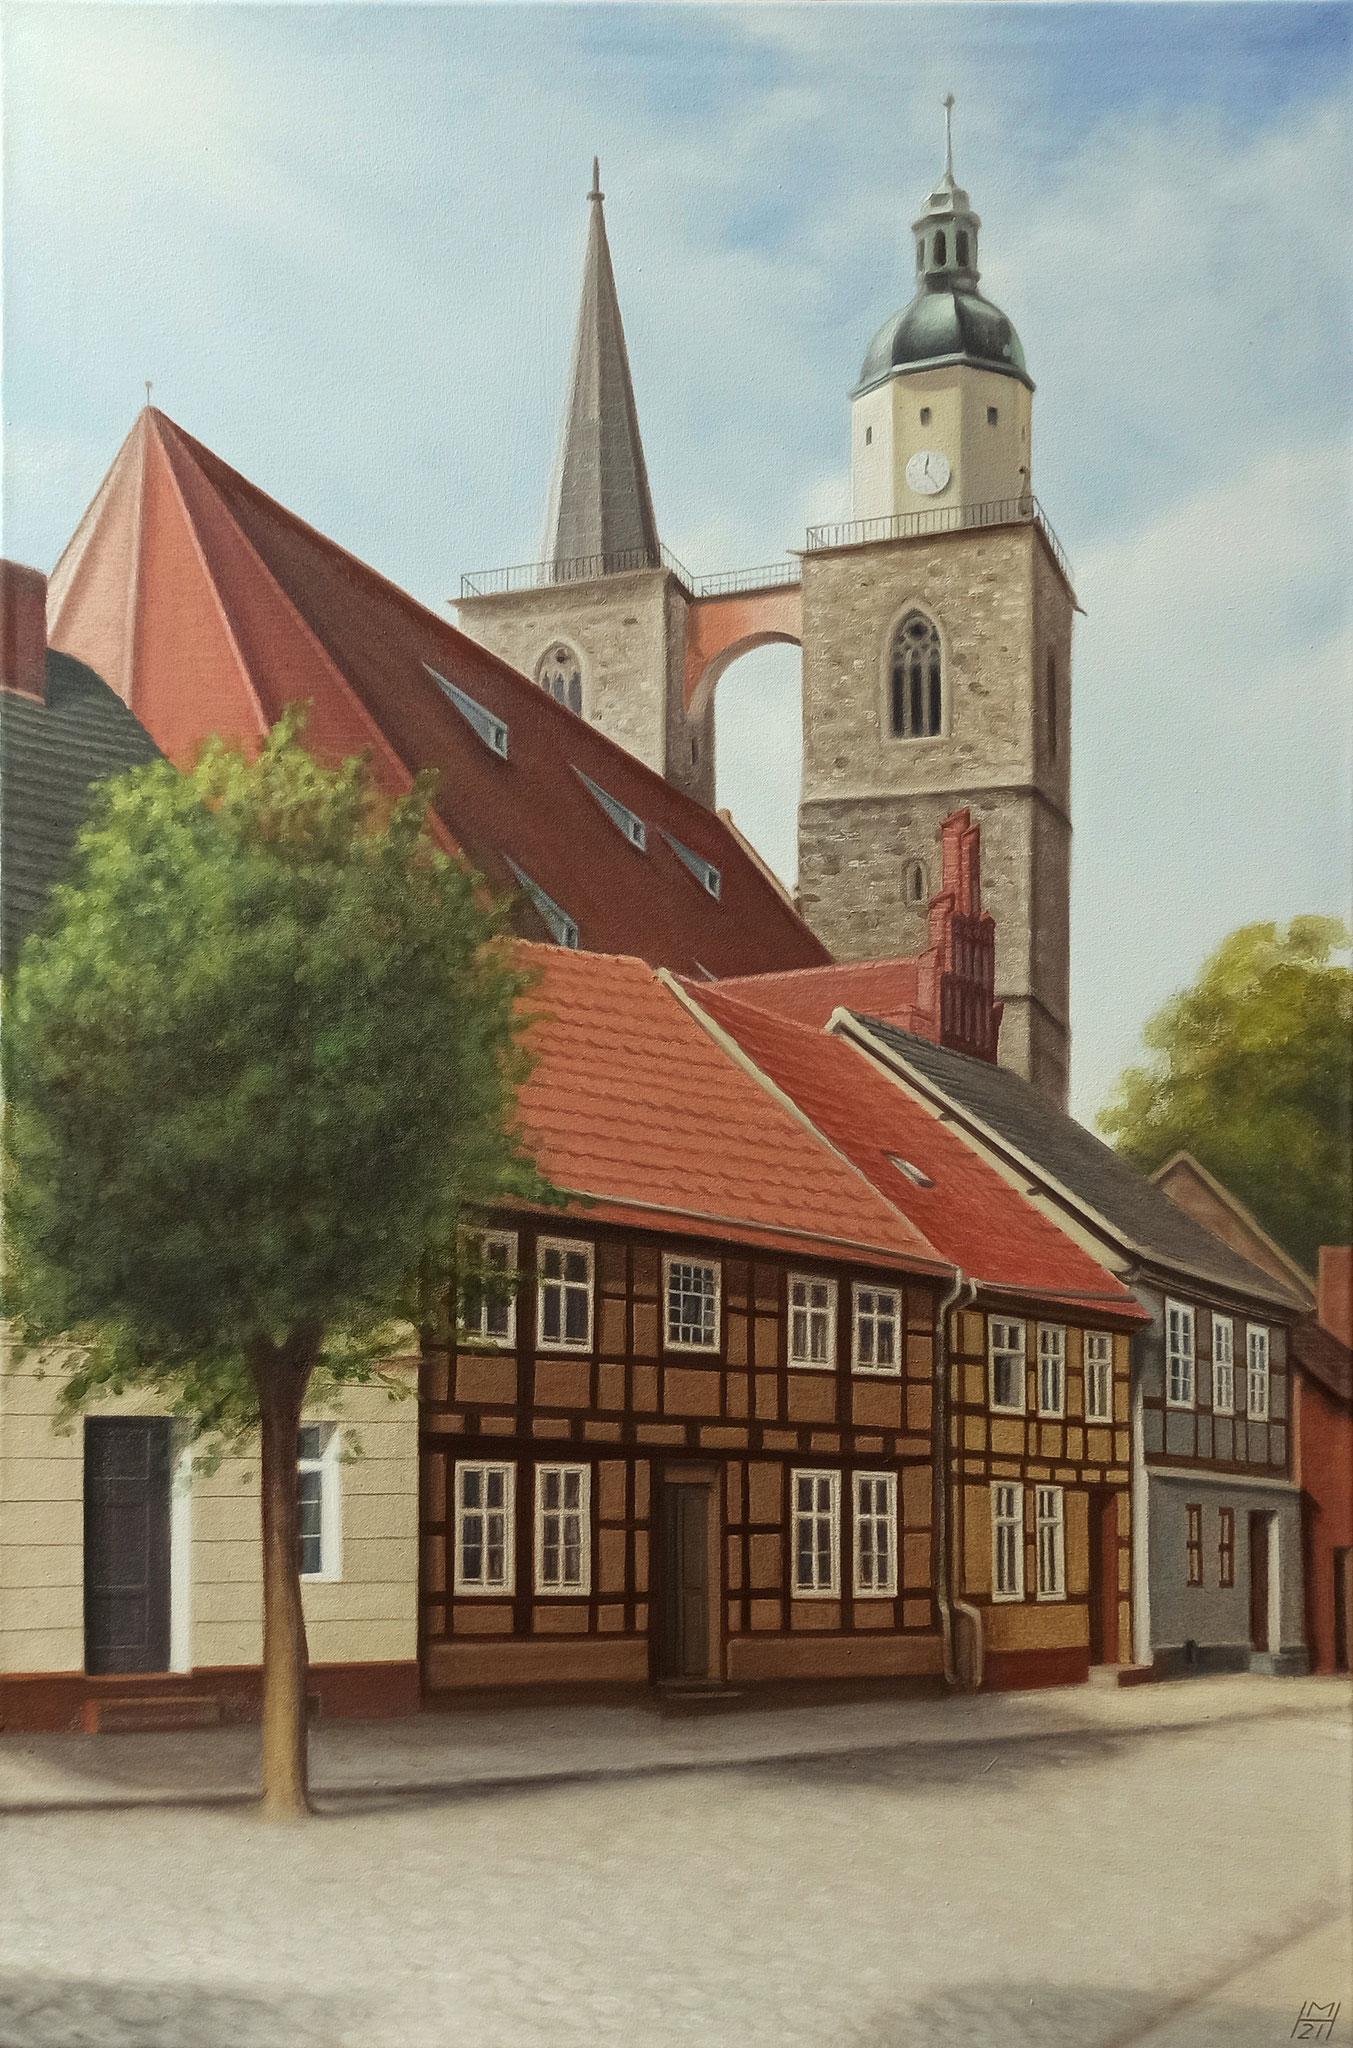 Nikolaikirche zu Jüterbog, Öl auf Leinwand, 76 x 114 cm